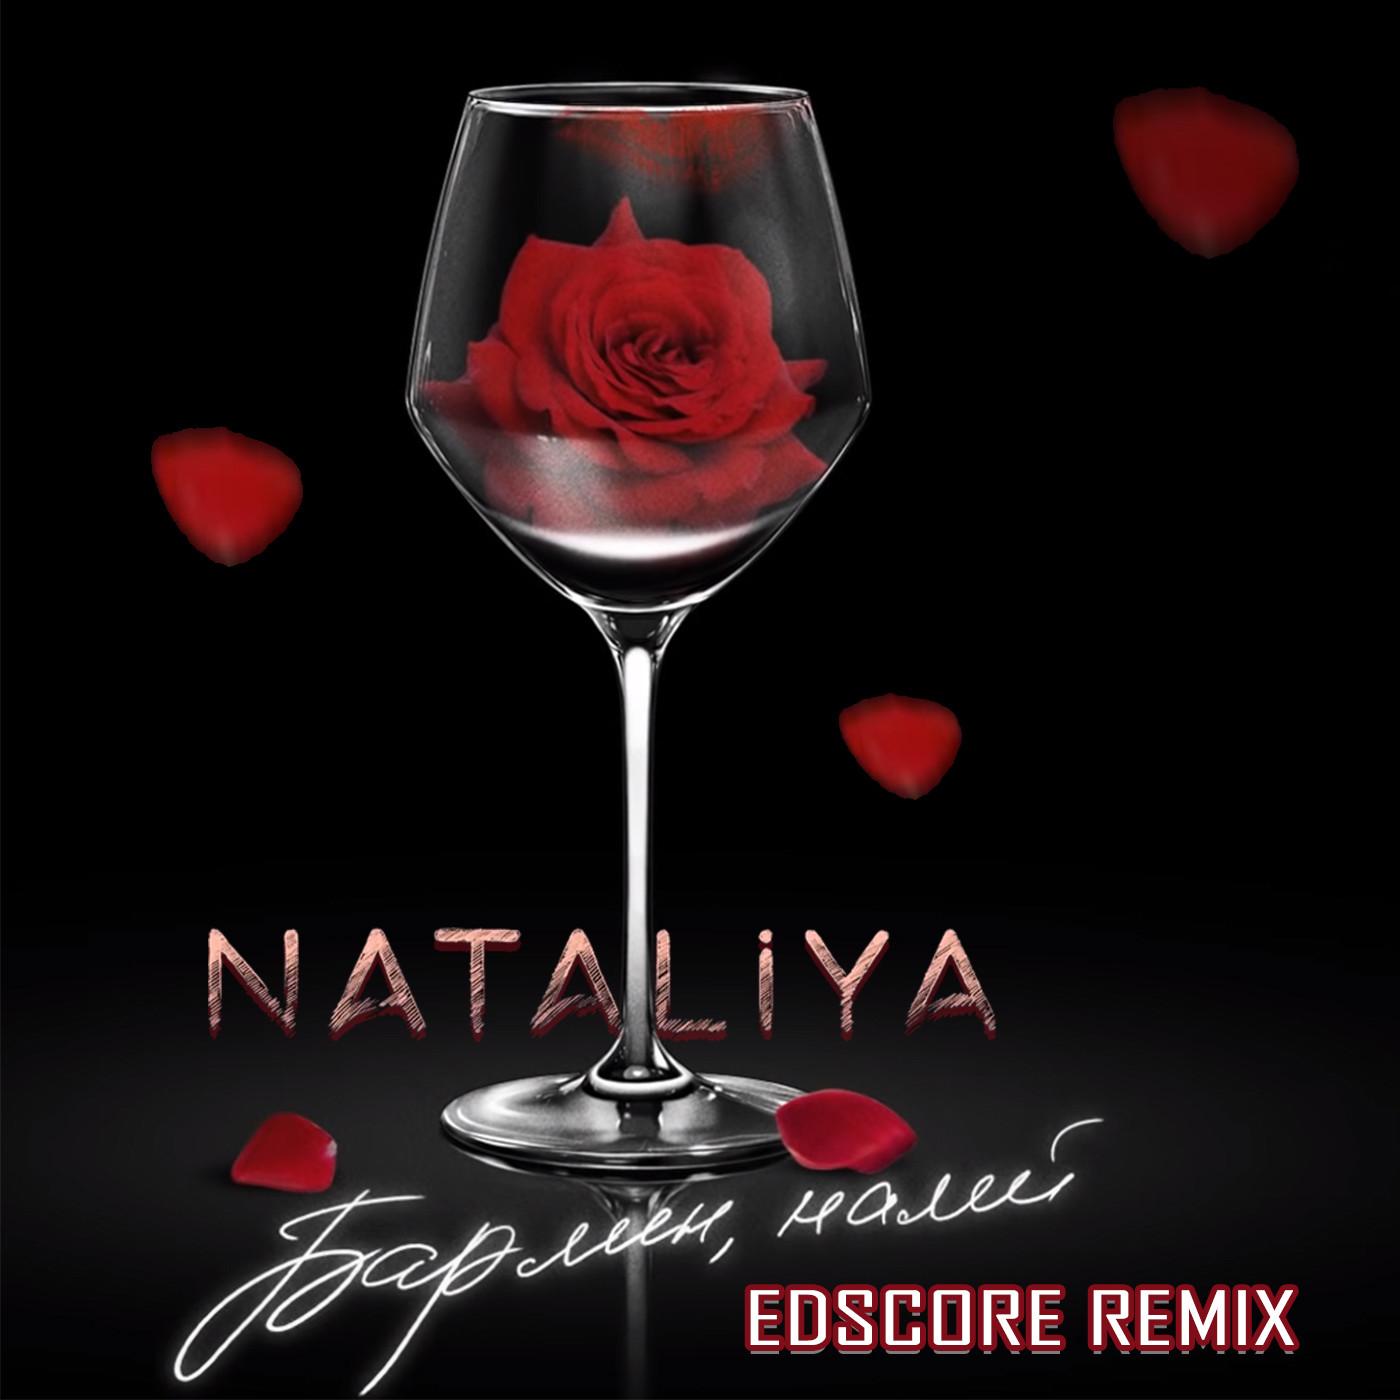 NATALiYA - Бармен, налей (EDscore Remix)